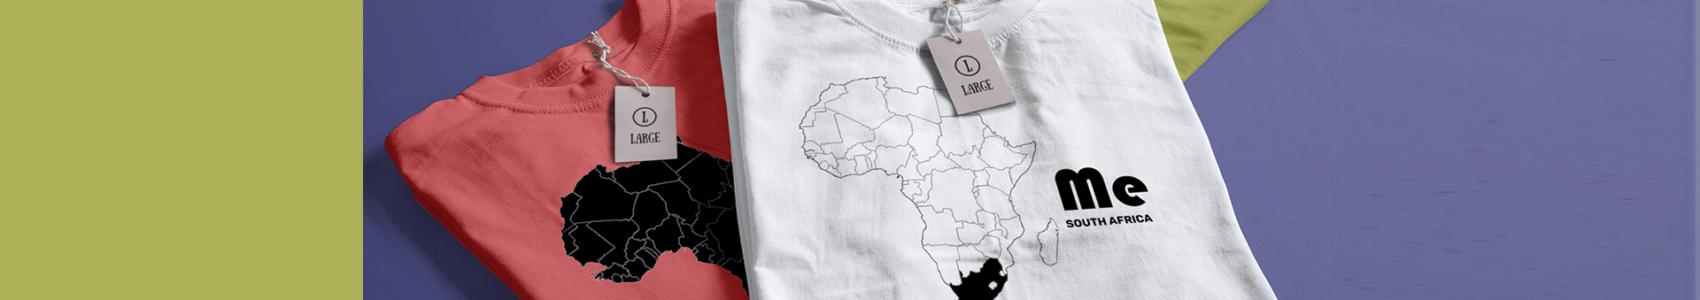 africame shop T-Shirts Multiple colors branded